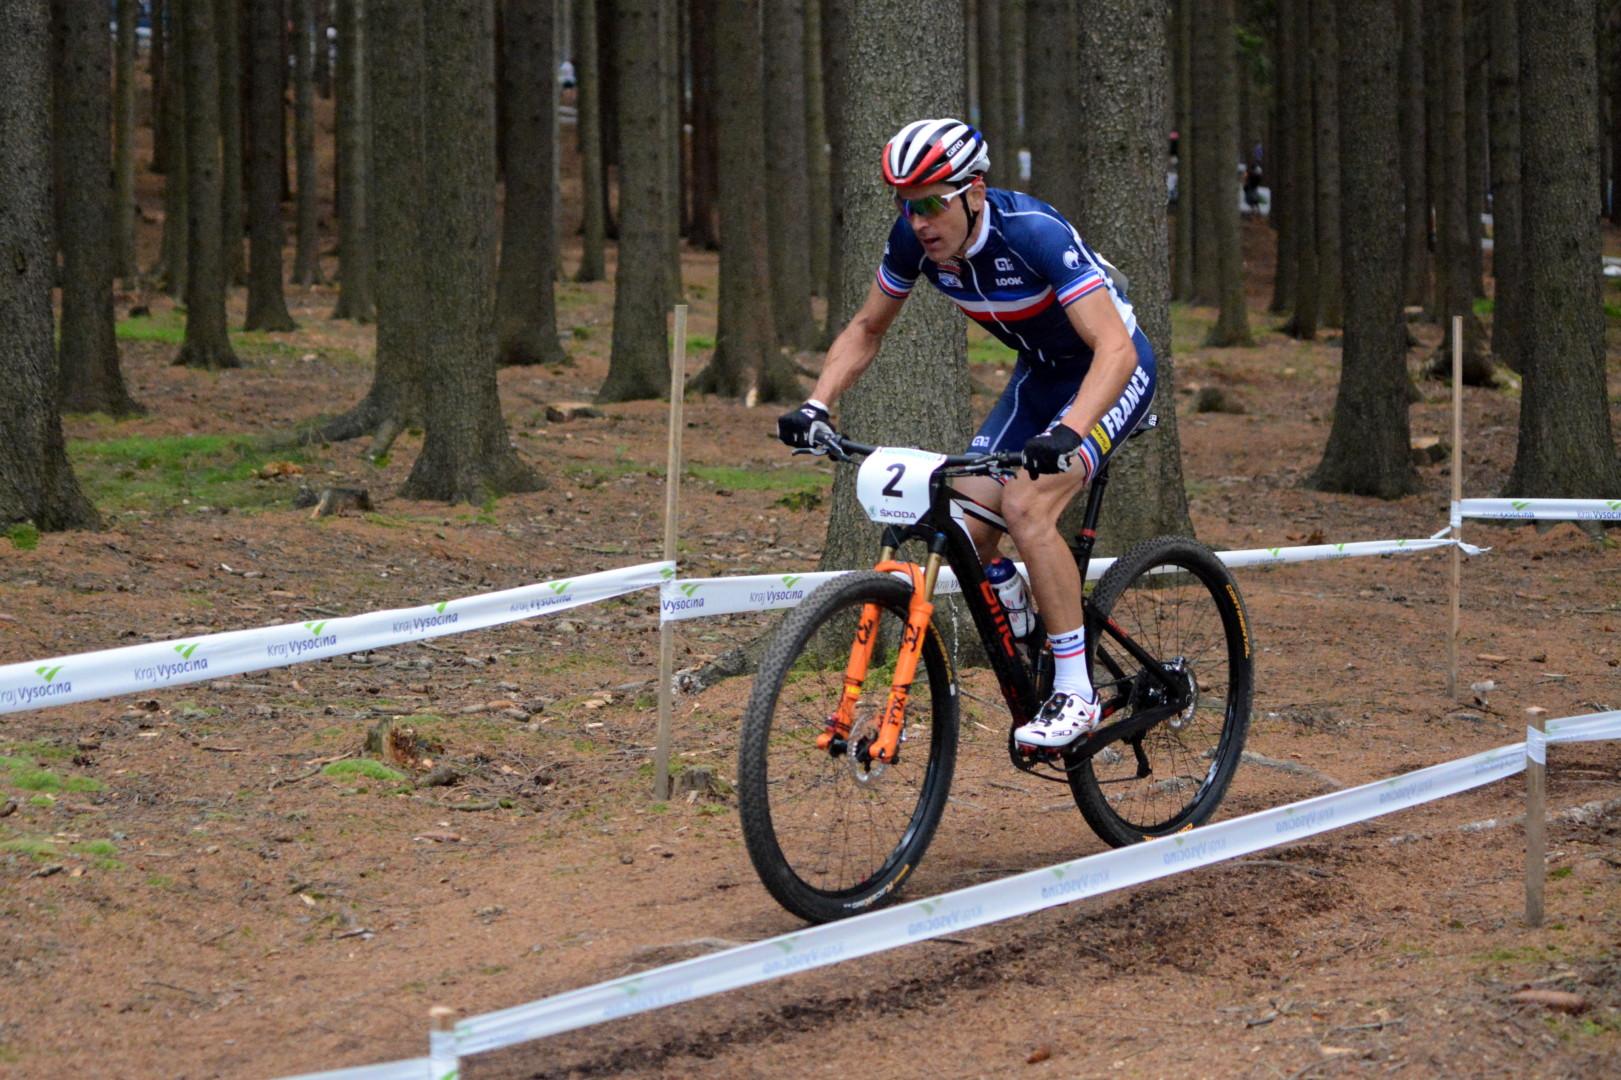 Julien Absalon (BMC MTB Racing Team) – Mistrzostwa Świata XCO, Nove Mesto, Czechy